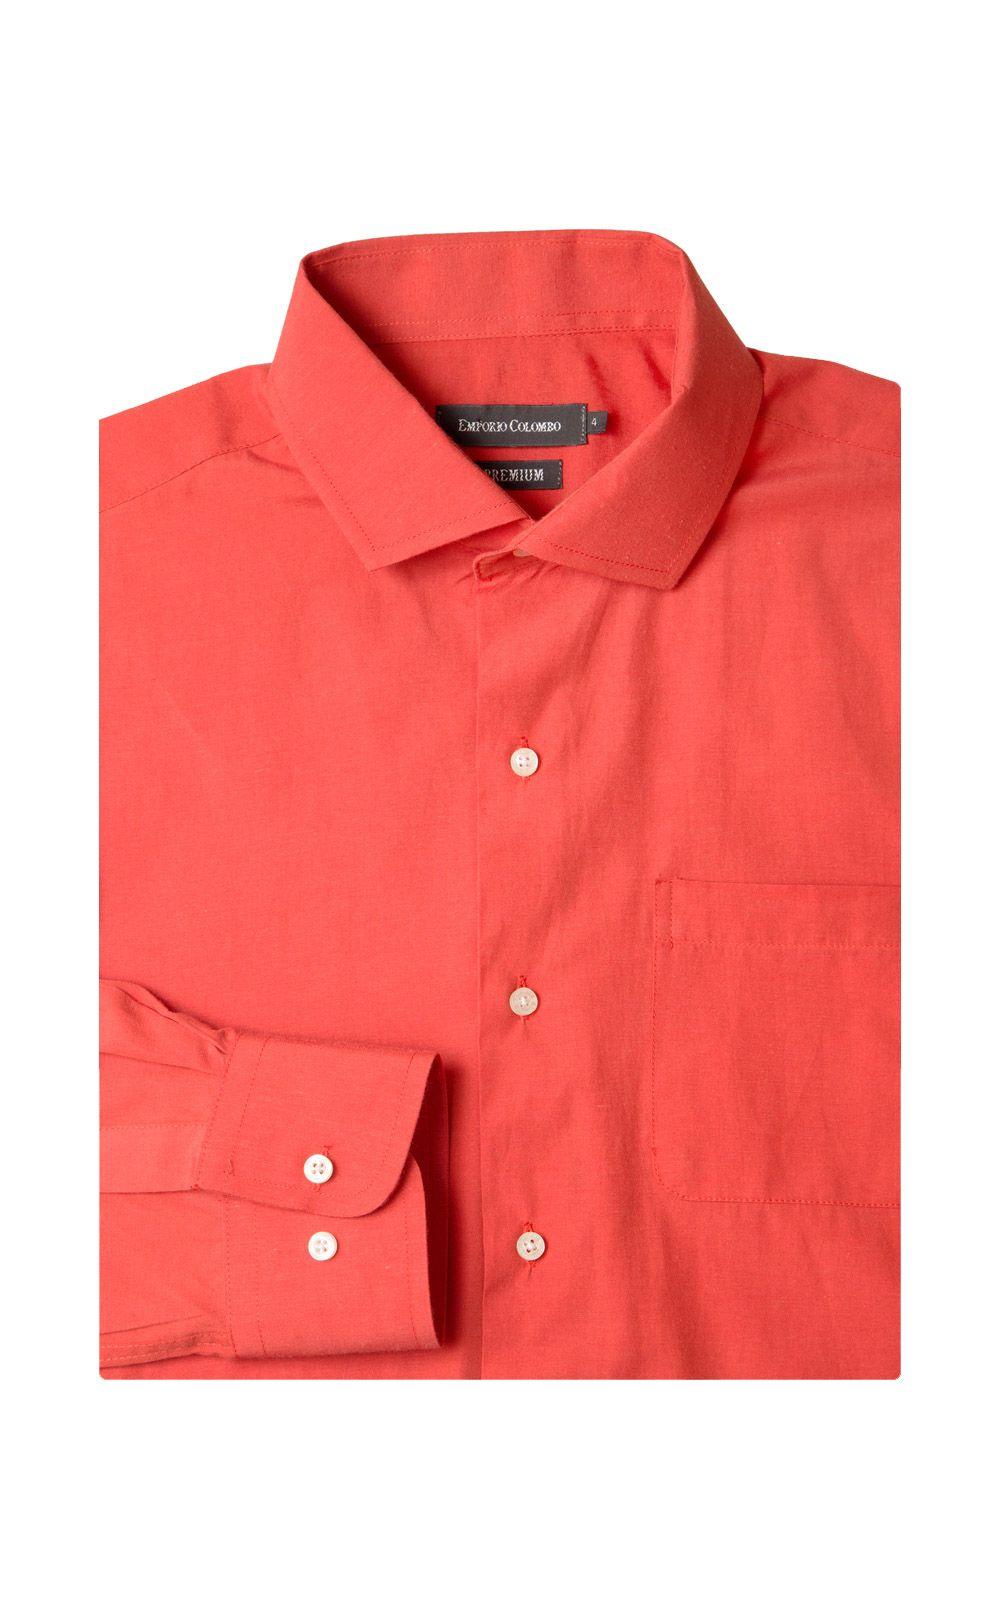 Foto 4 - Camisa Social Masculina Laranja Lisa